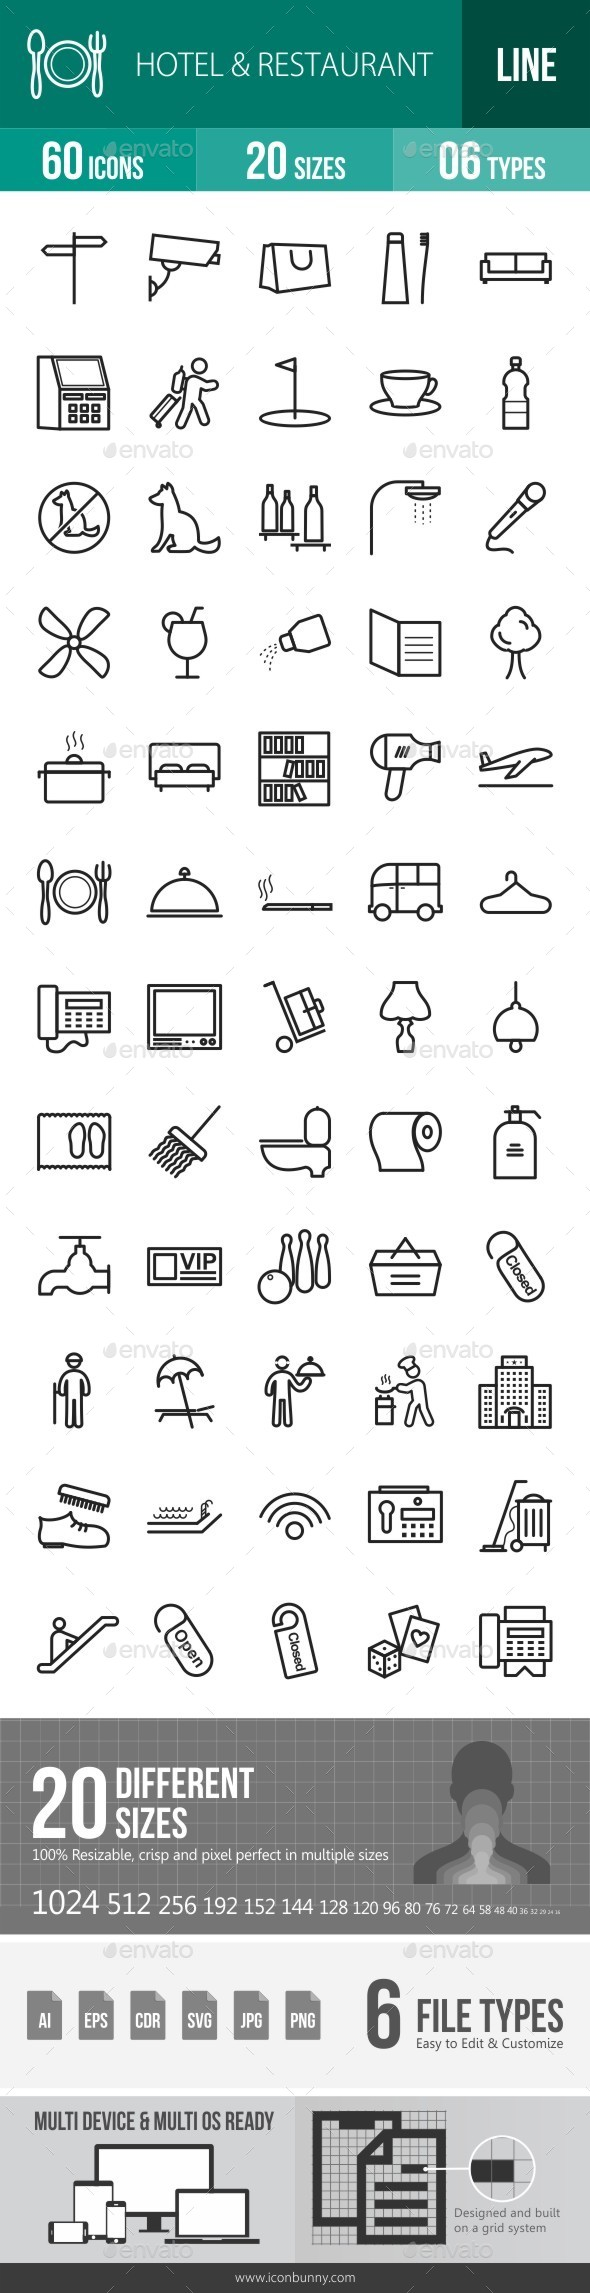 Hotel & Restaurant Line Icons - Icons